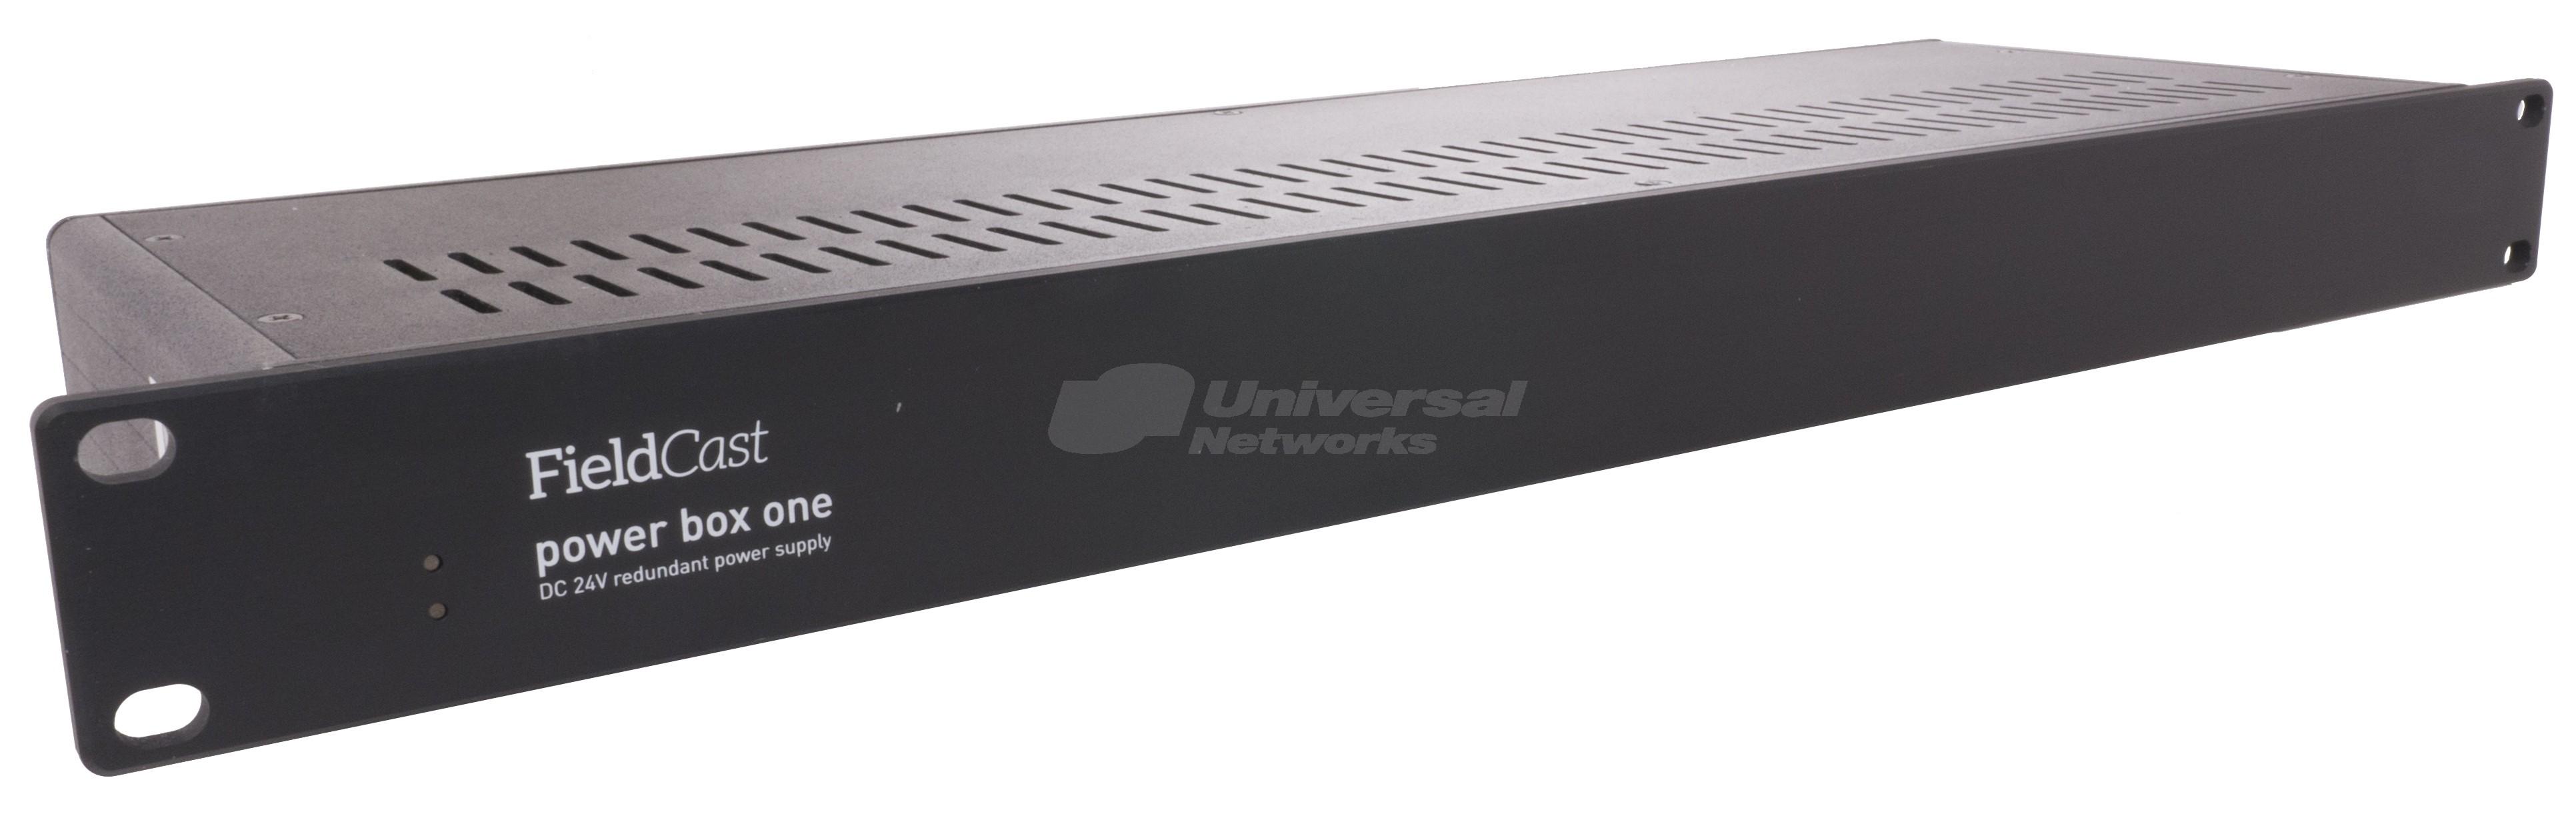 FieldCast Power Box One